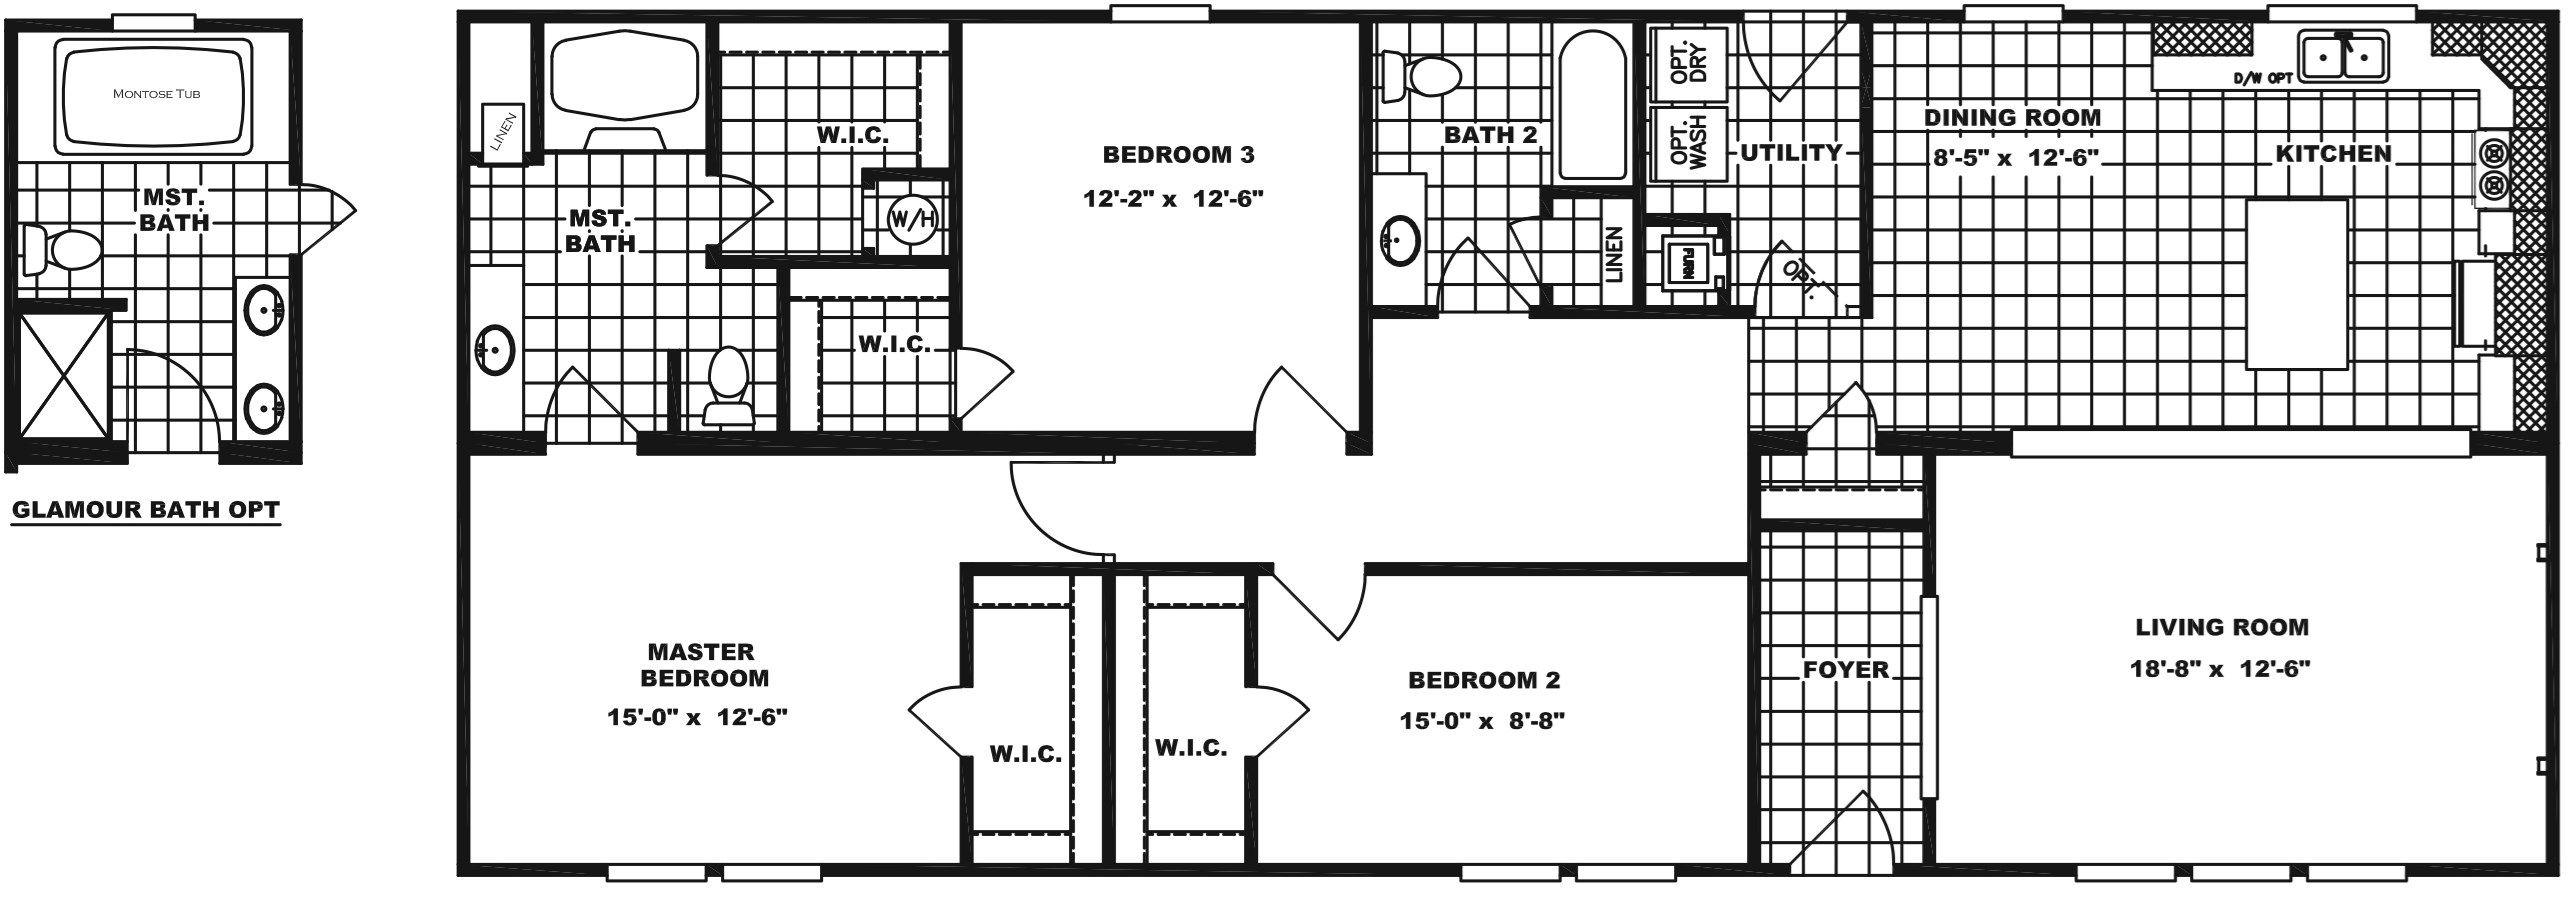 Interactive Floor Plan Modular Homes For Sale Modular Homes Floor Plans